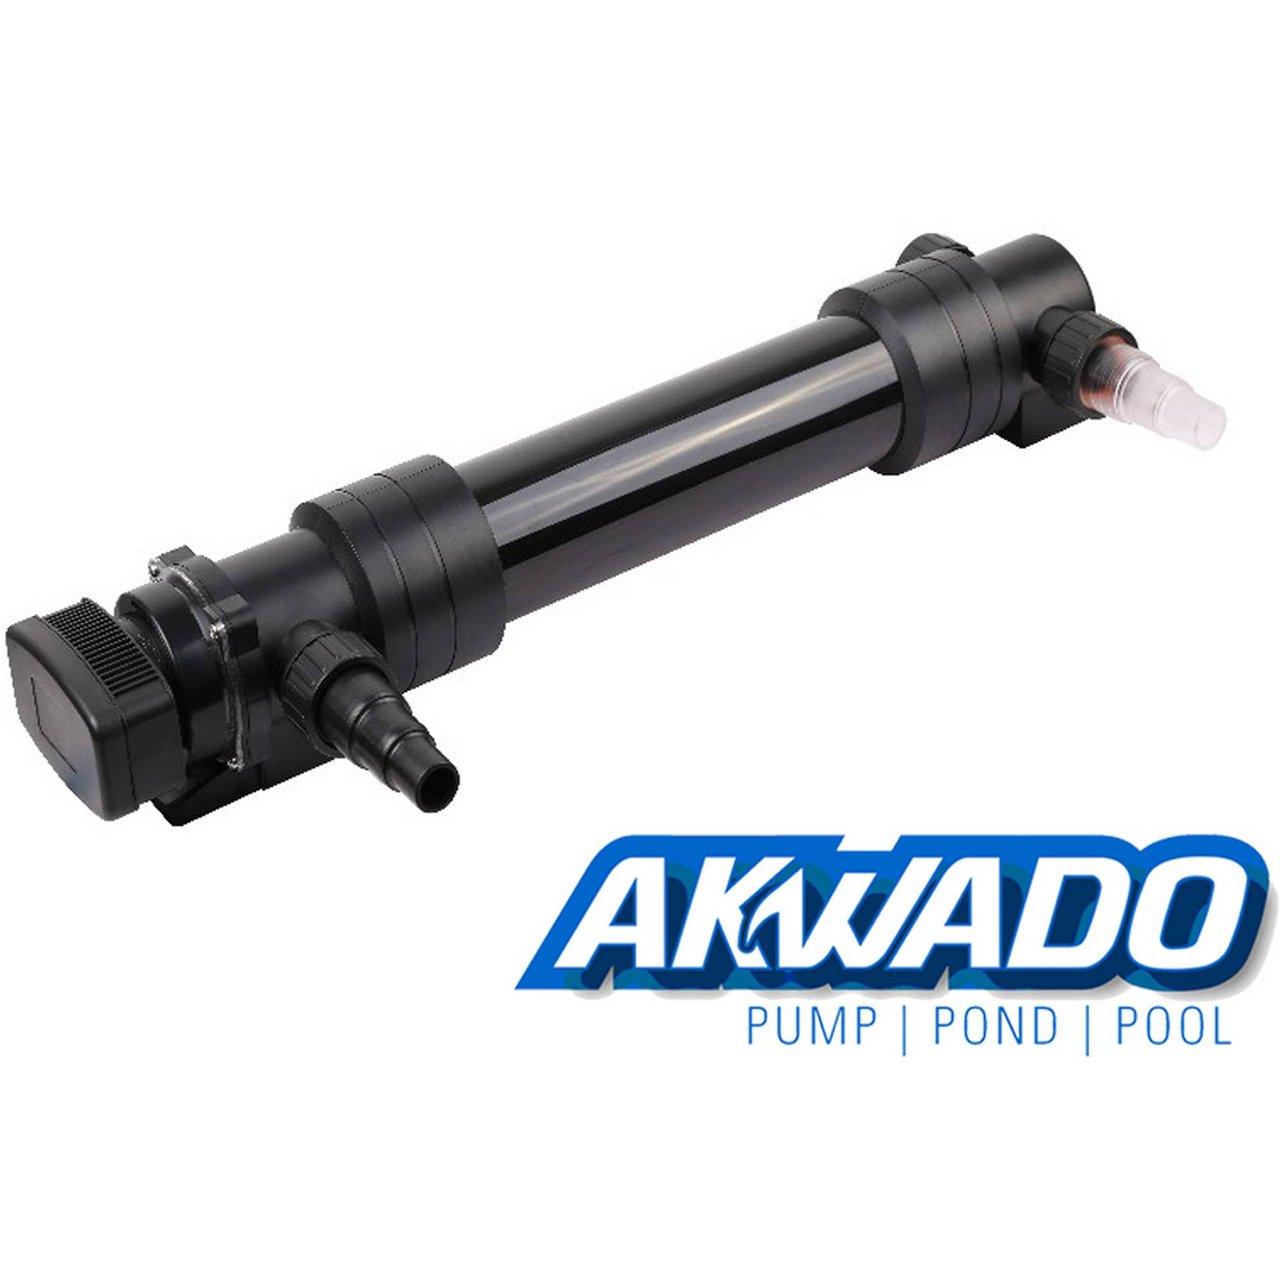 AKWADO UVC-Klärer 36W